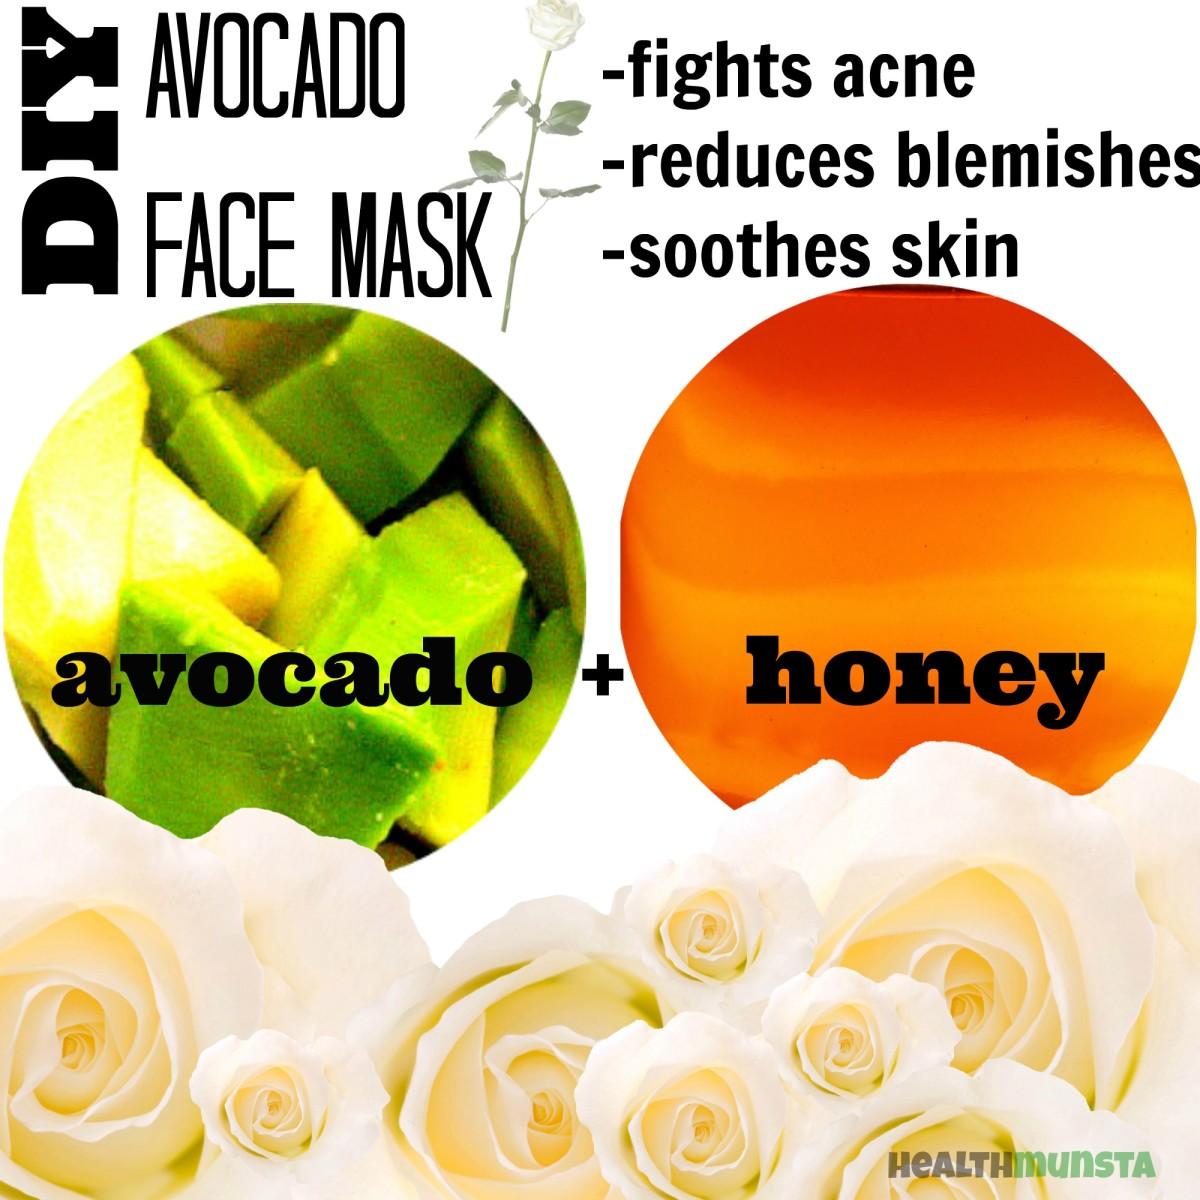 amazing-avocado-face-mask-recipes